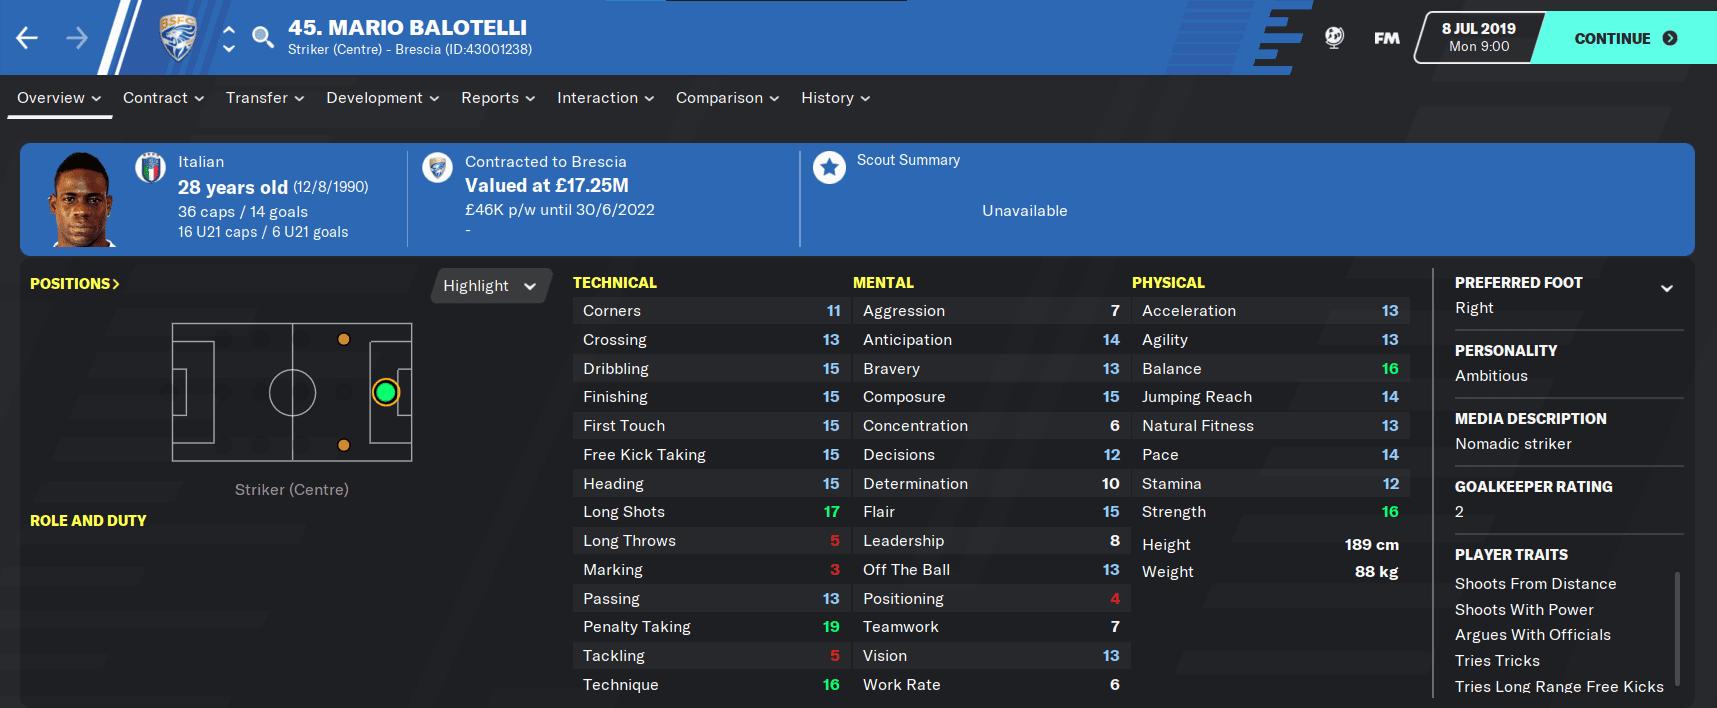 Striker - Mario Balotelli